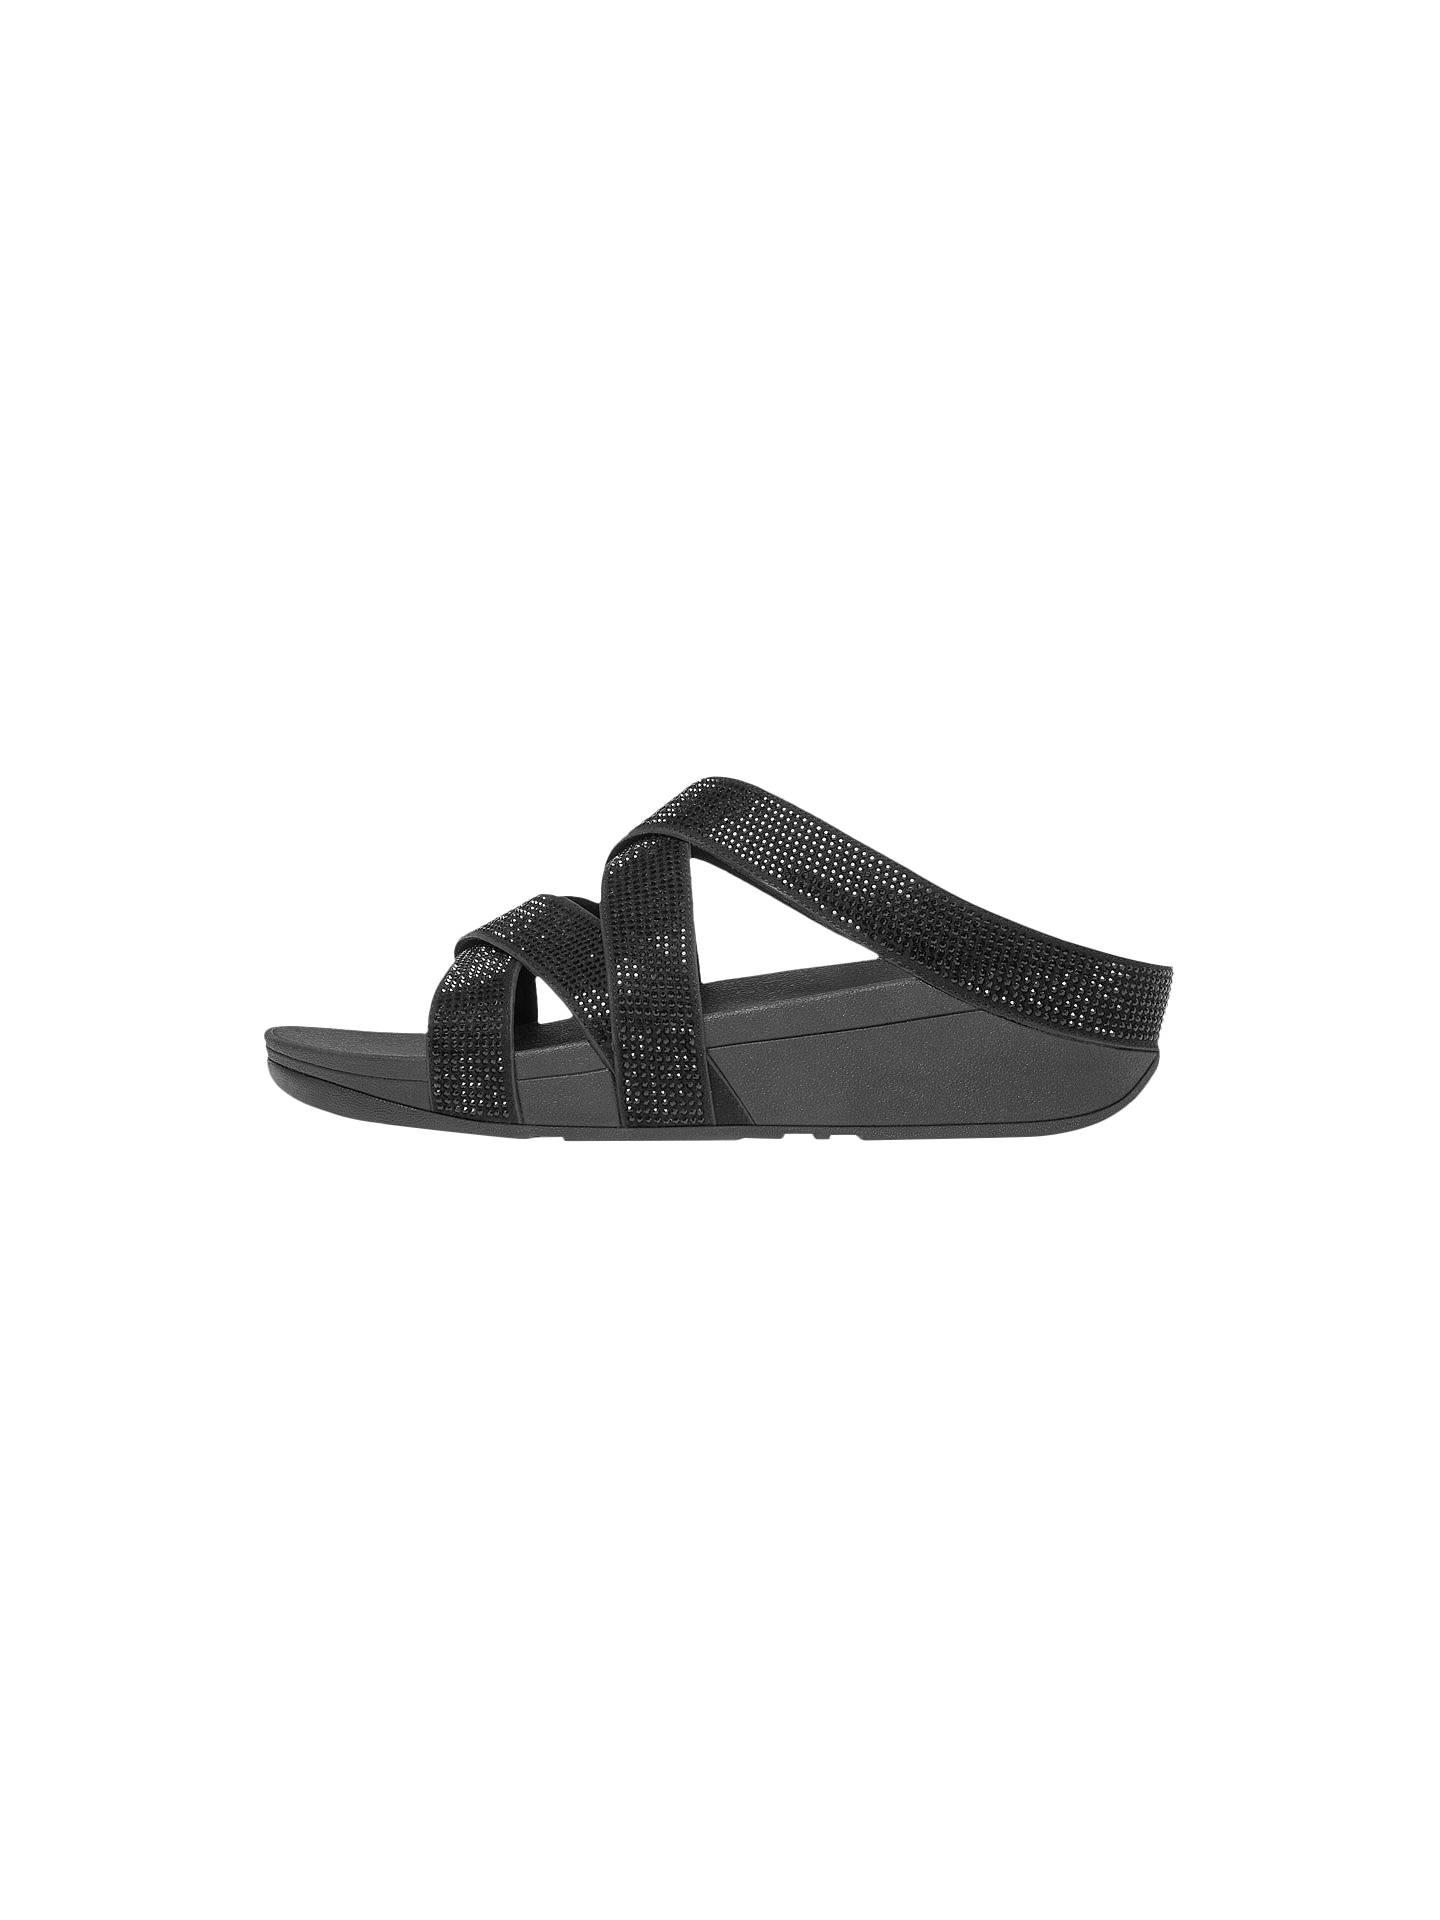 97a91b91d5c1 FitFlop Slinky Rokkit Criss Cross Sandals at John Lewis   Partners